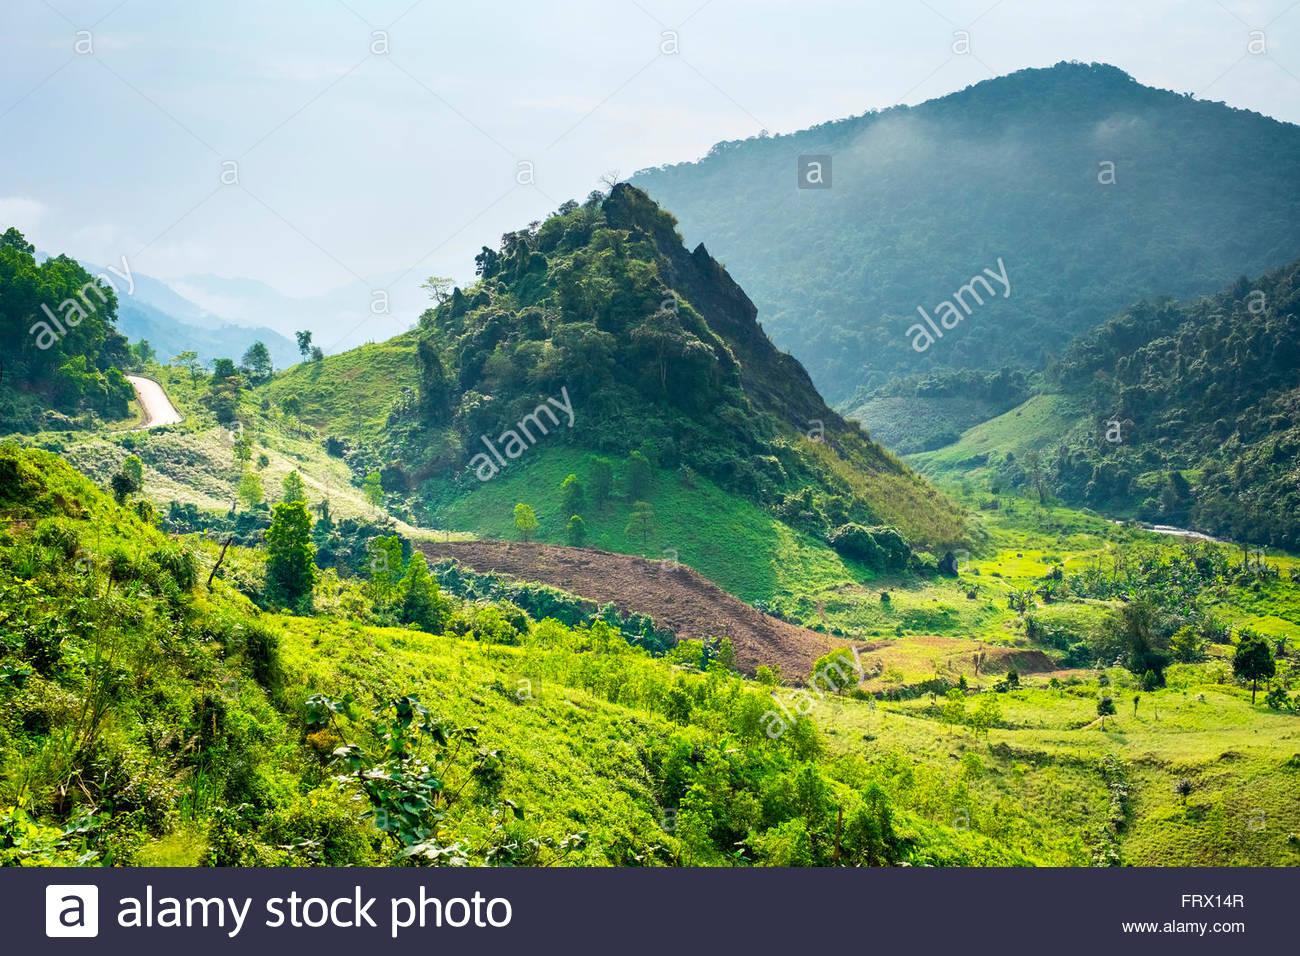 Paisaje montañoso junto a Ho Chi Minh Highway West cerca de Khe Sanh, Da Krong, distrito de la provincia de Imagen De Stock